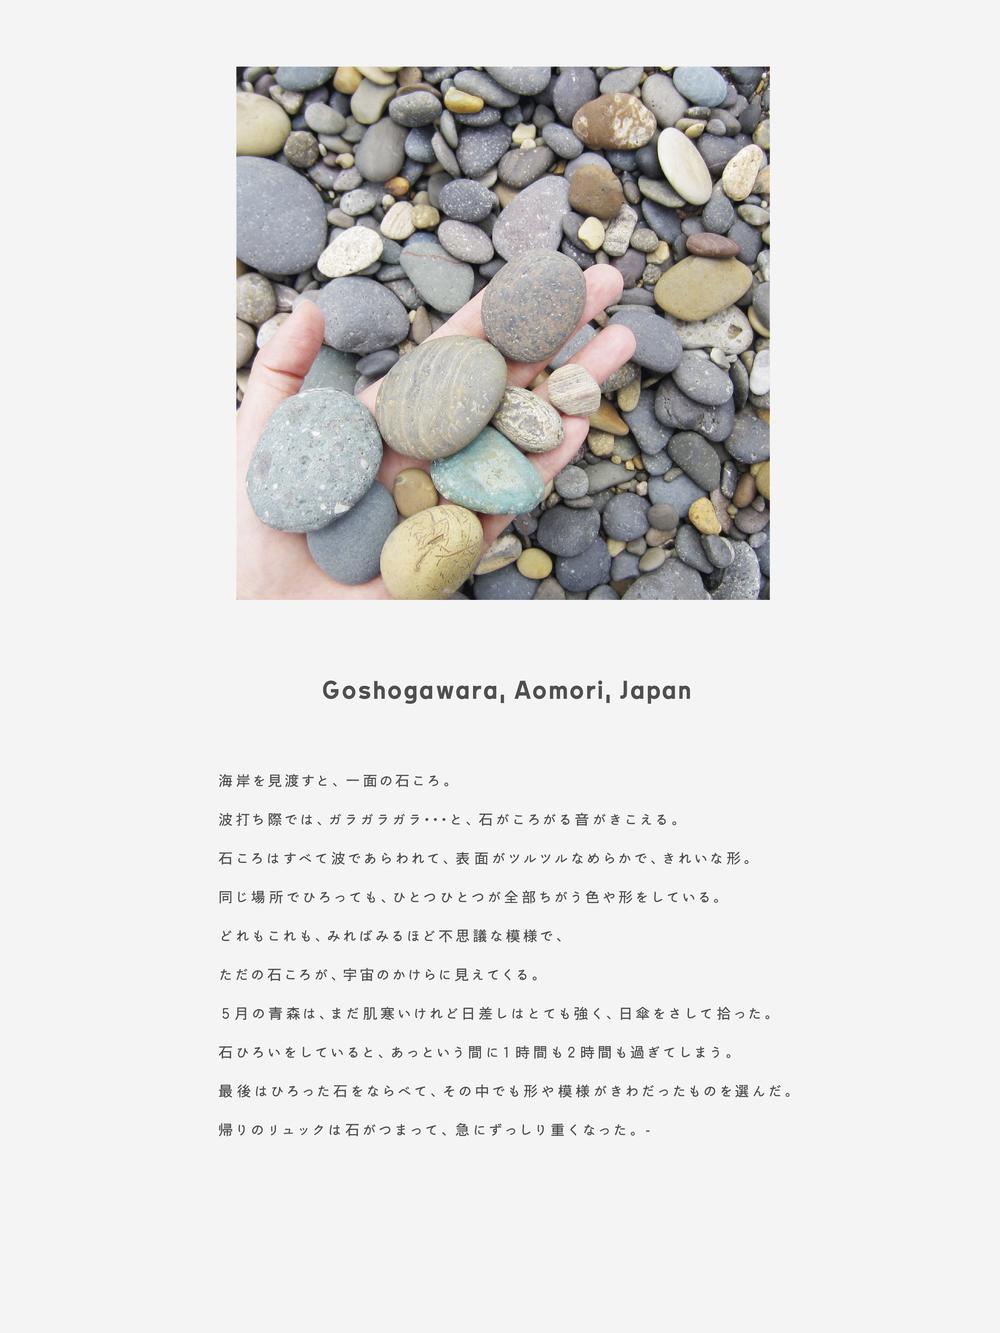 stone_location_goshogawara.jpg